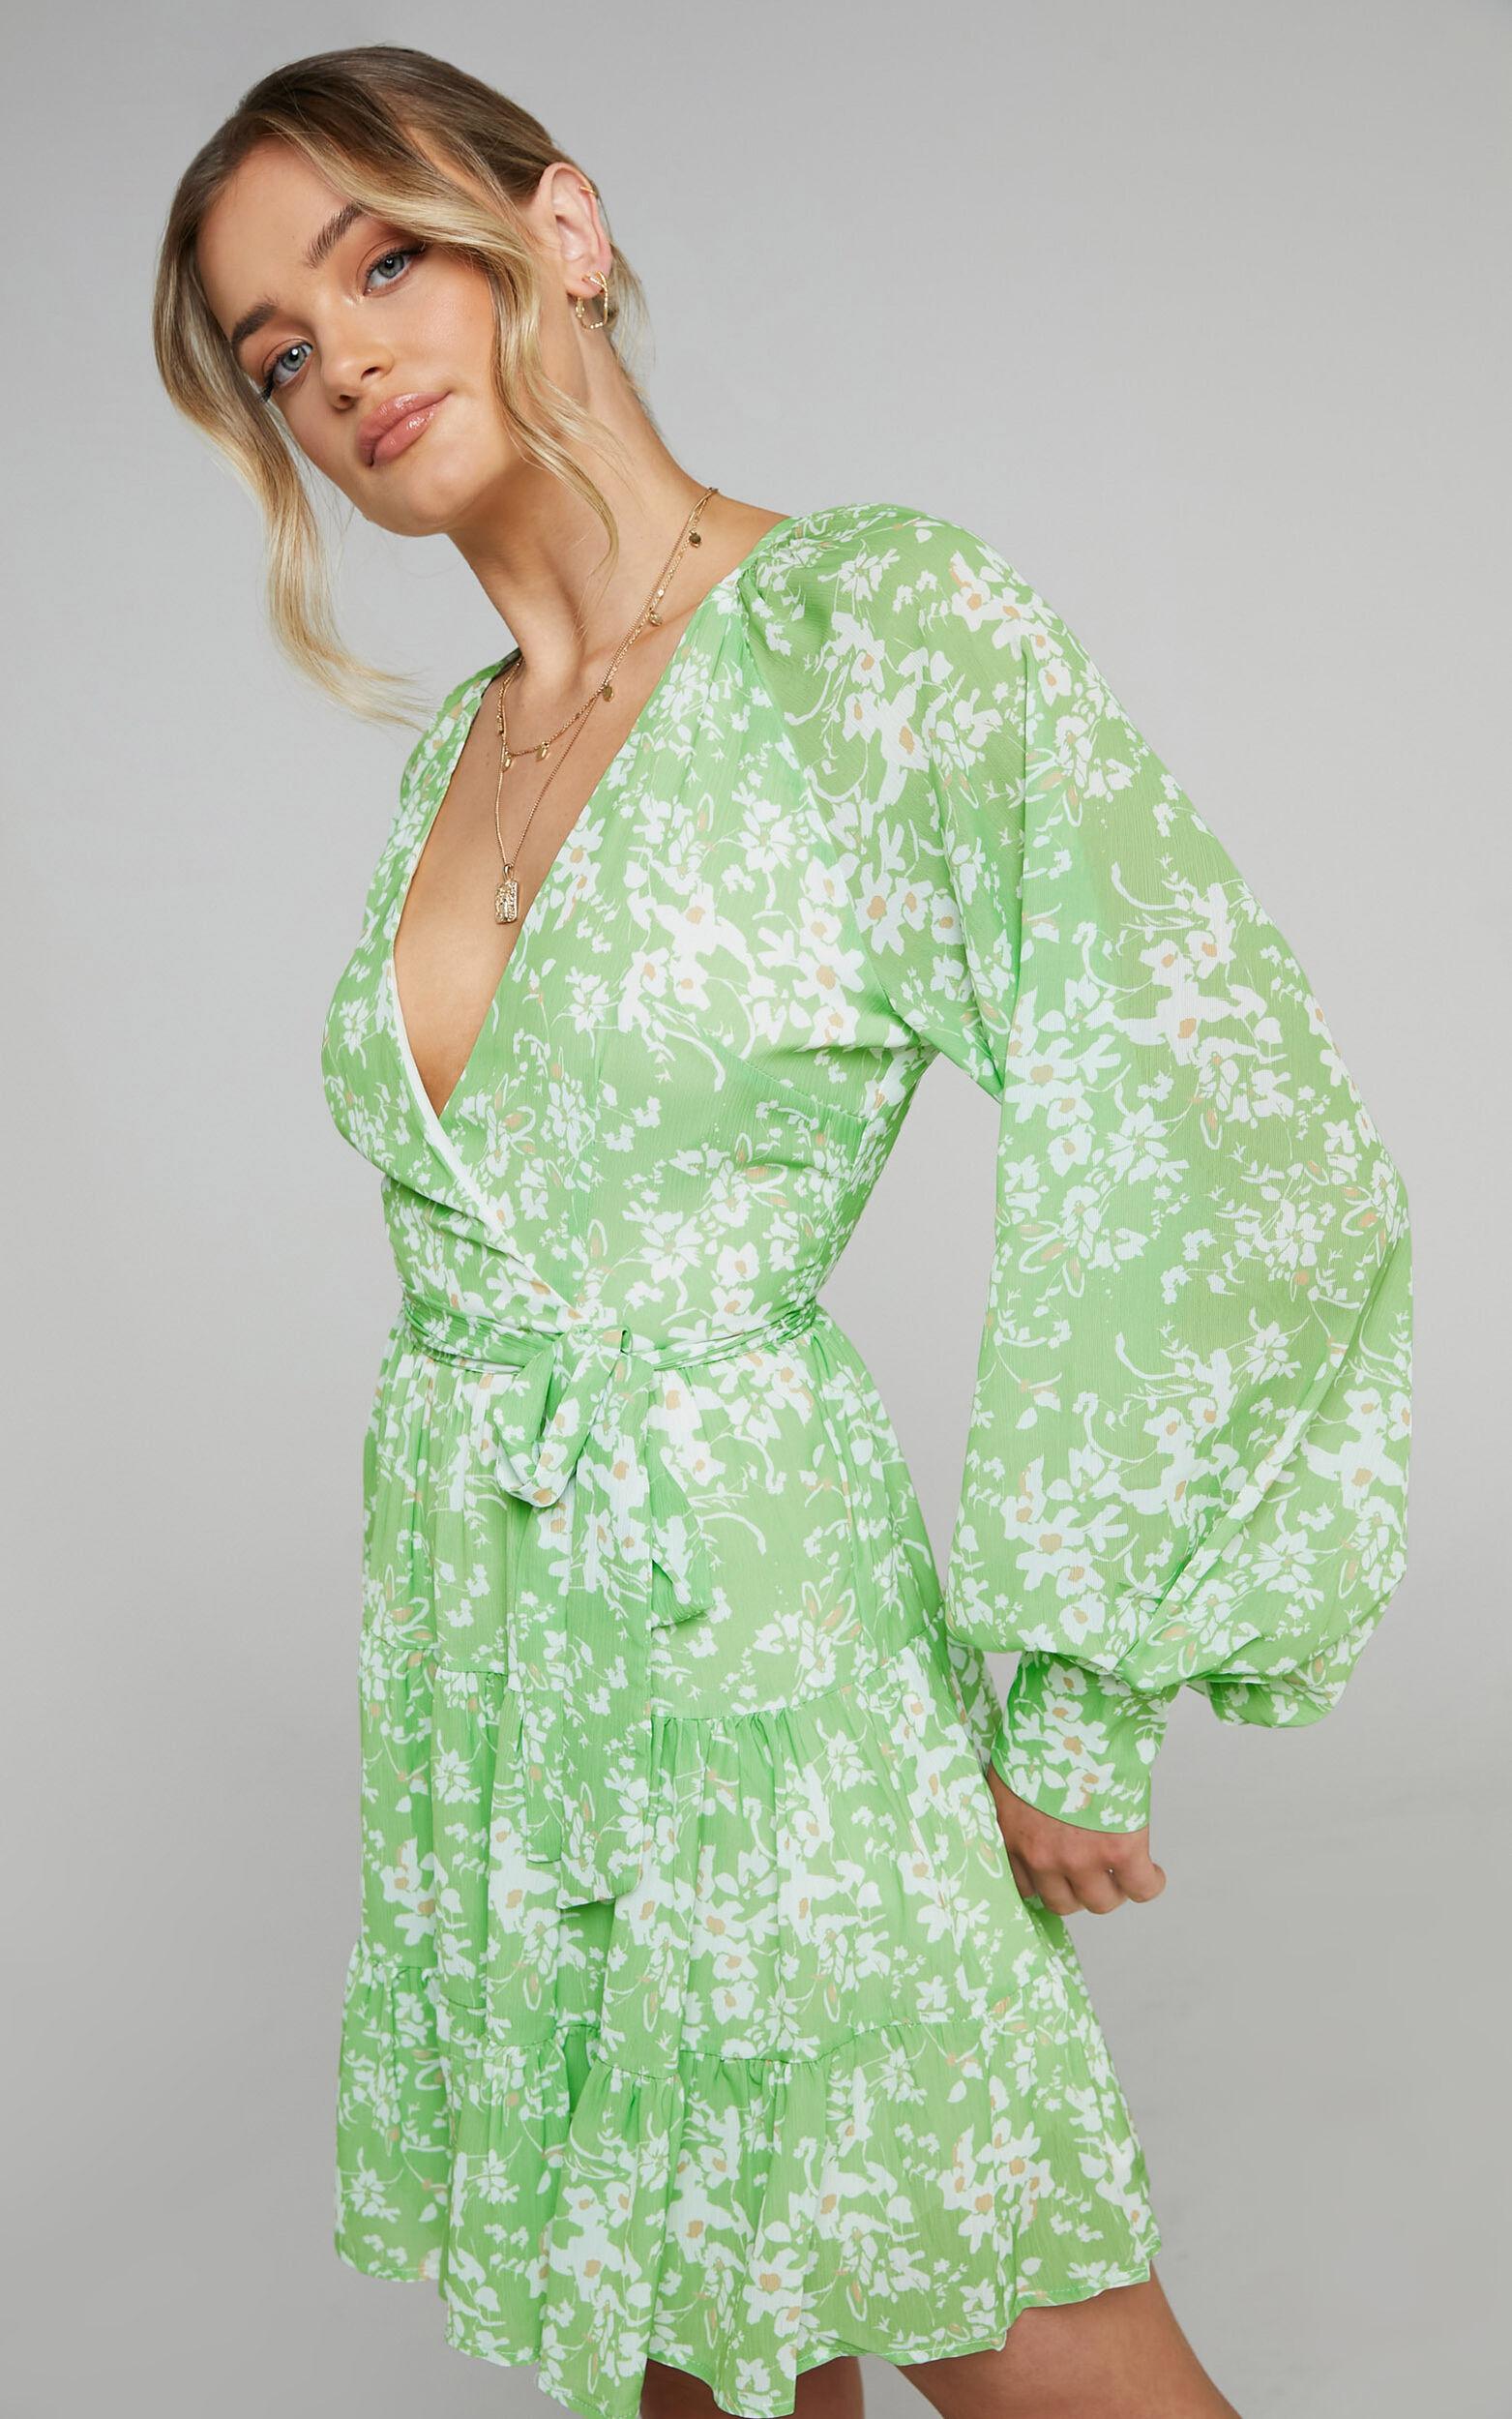 Libby Printed Longsleeve V Neck dress in Whispering Floral - 04, GRN1, super-hi-res image number null